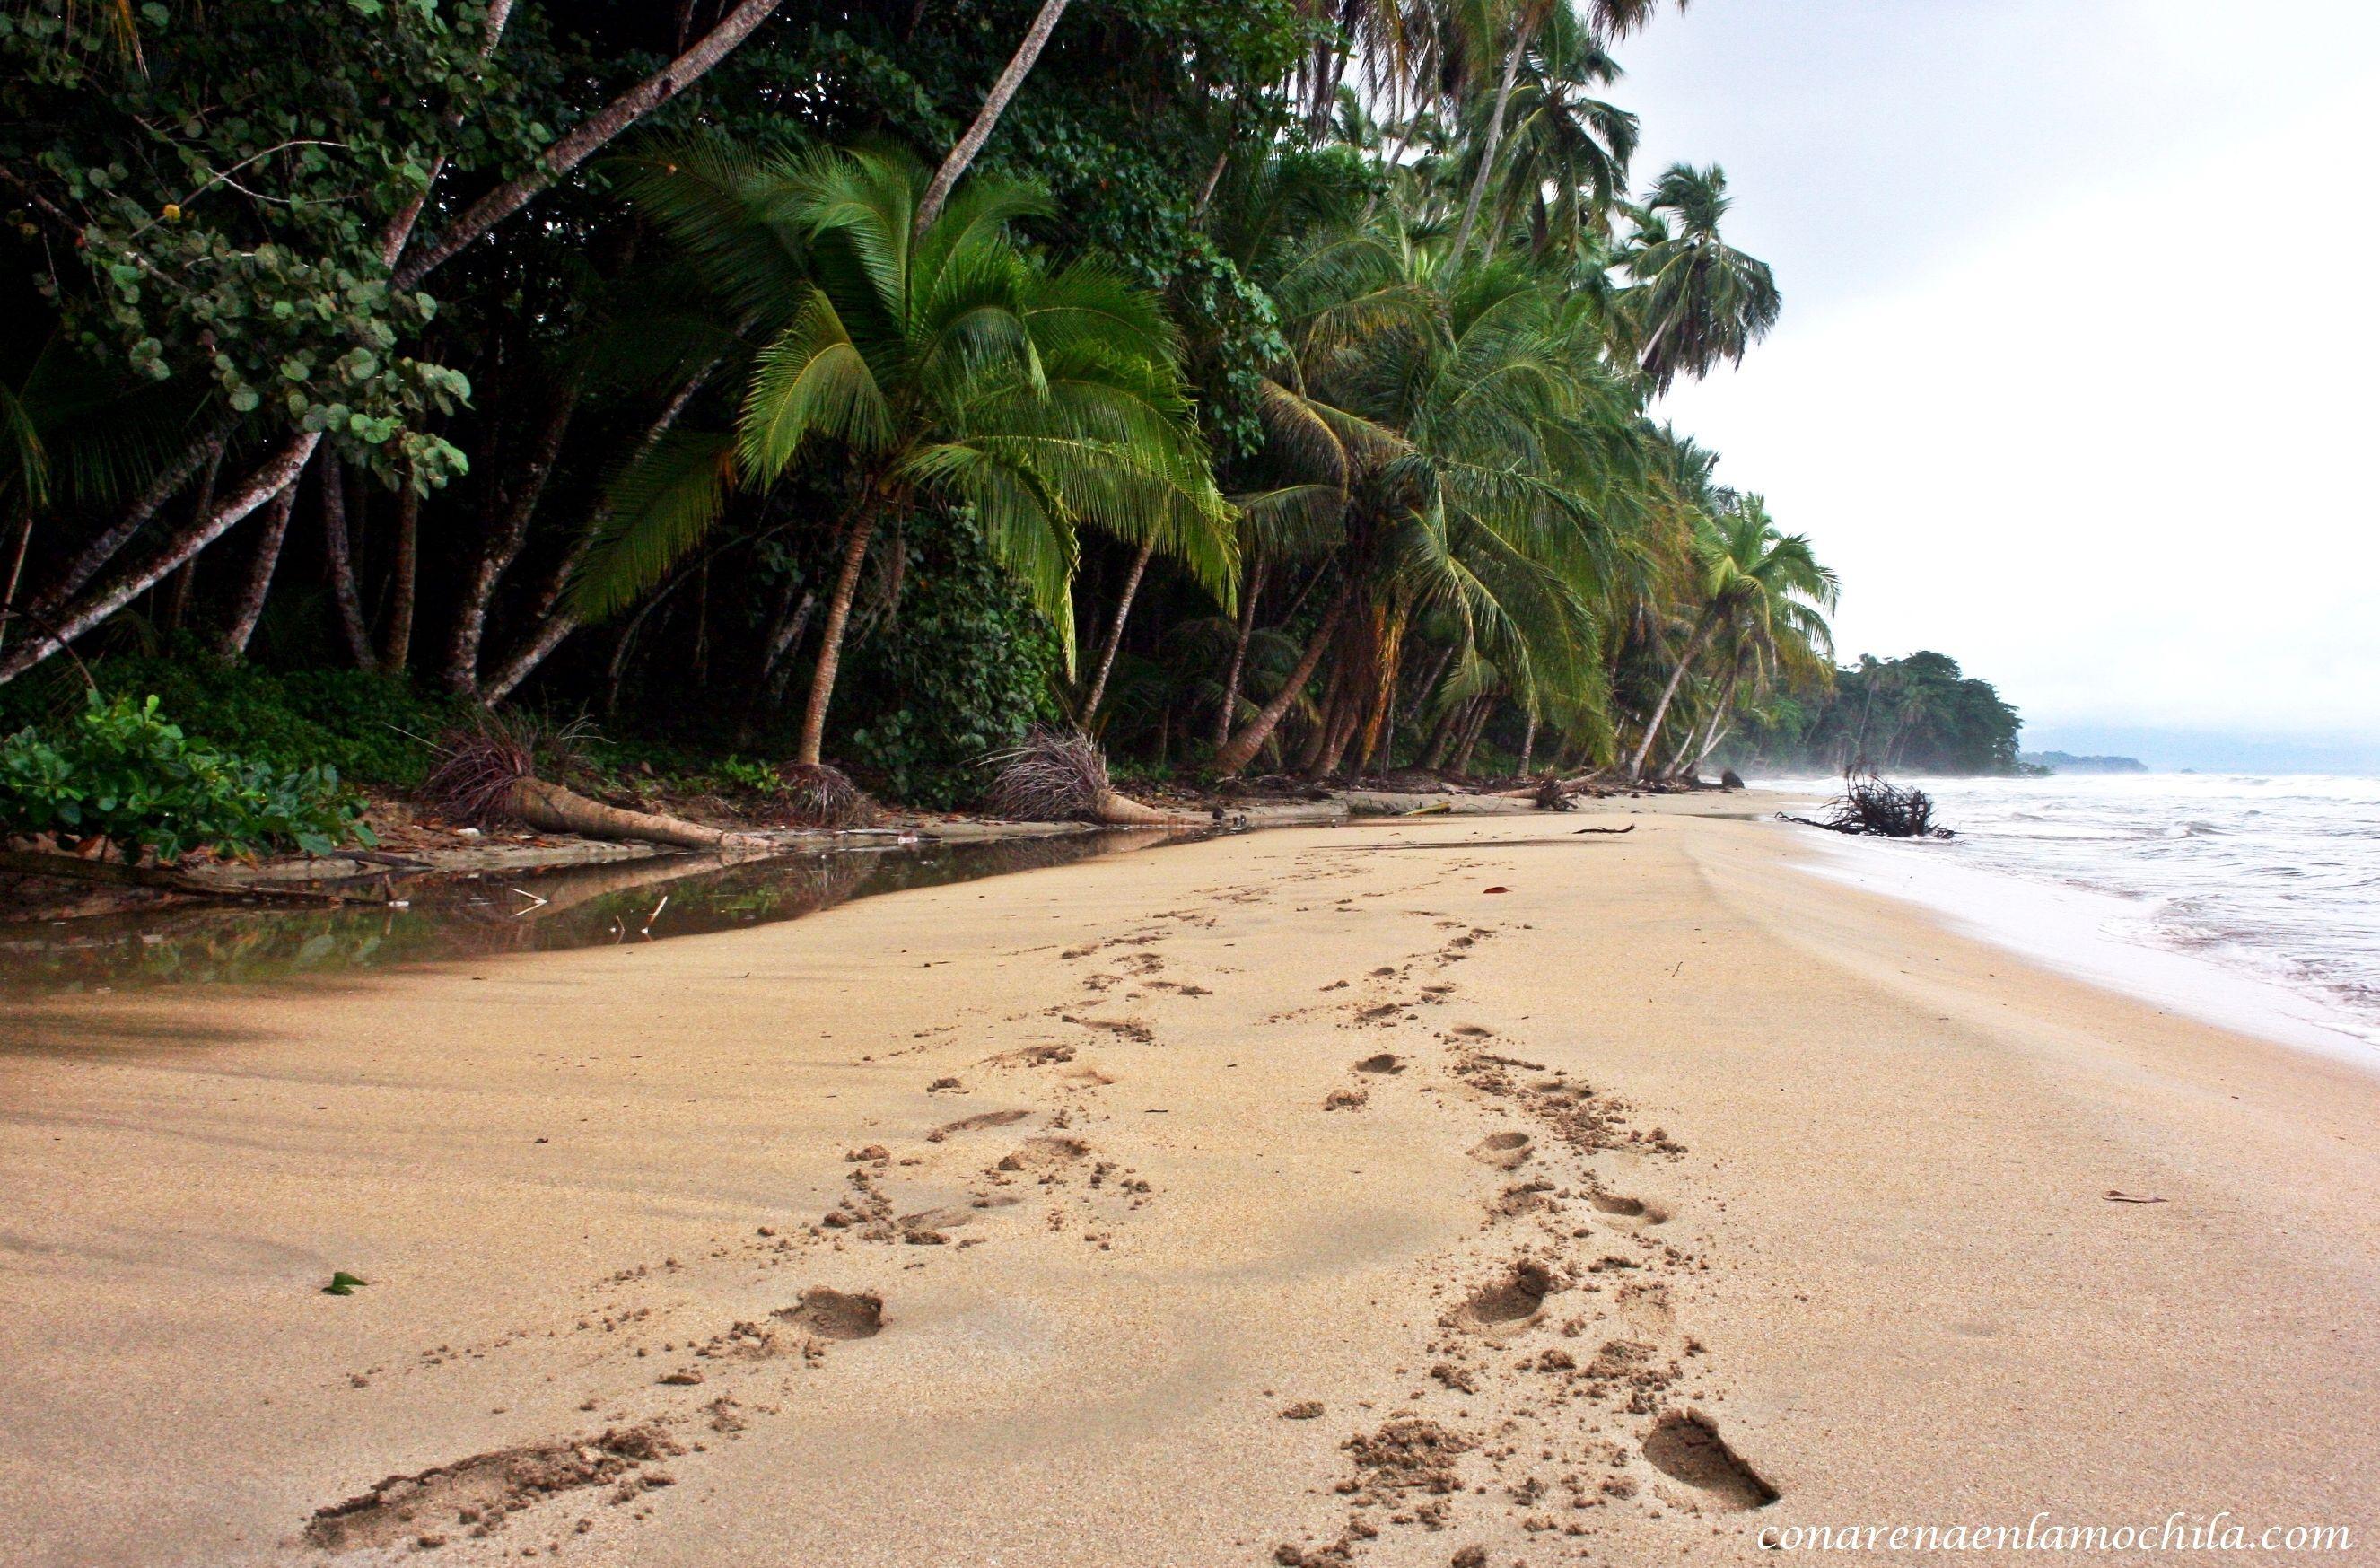 Parque Nacional de Corcovado: Un tesoro escondido en Costa Rica